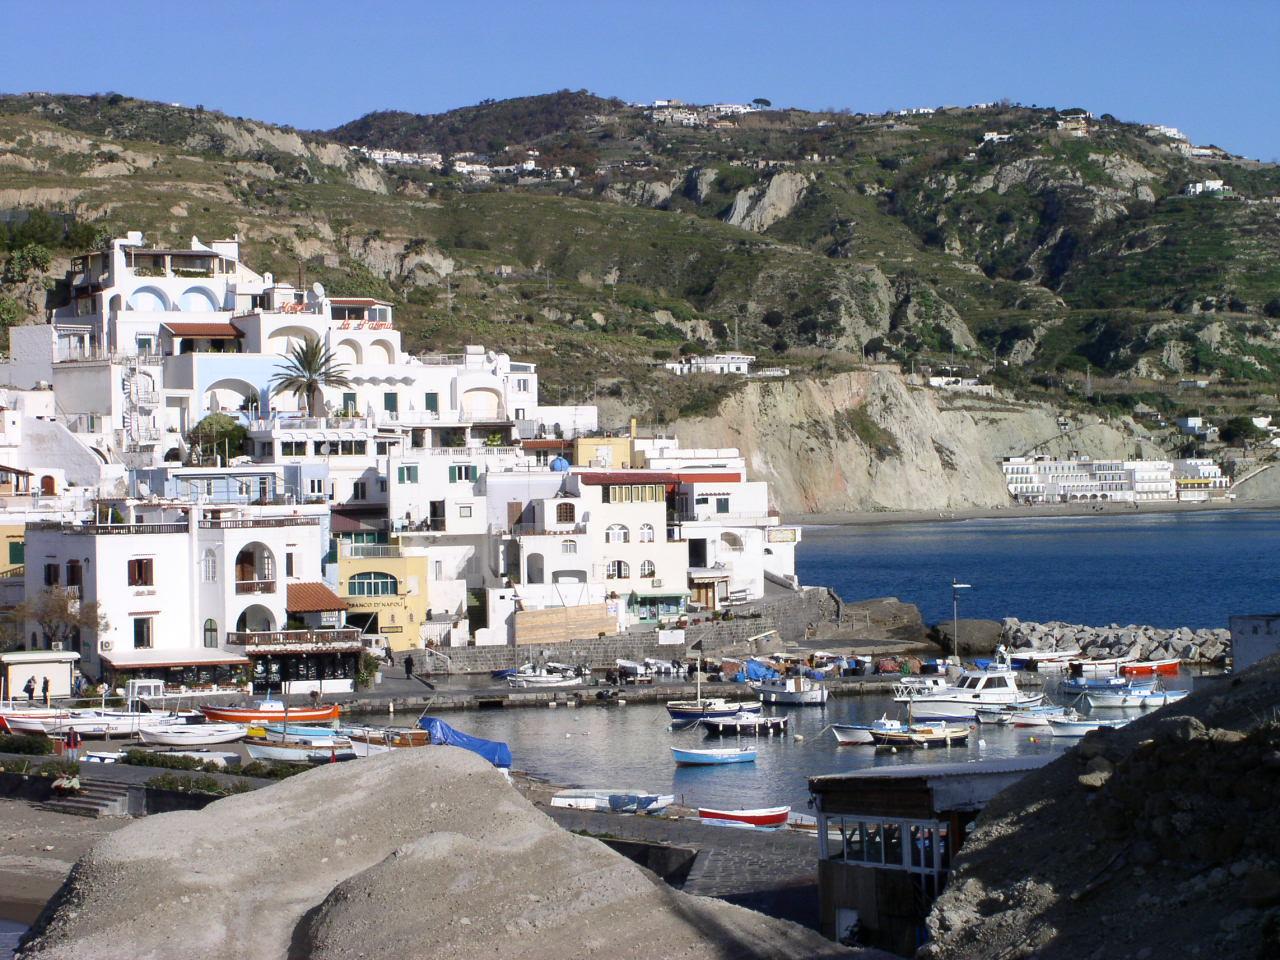 Noleggio Barche Ischia - Navalia | Noleggia un Sogno